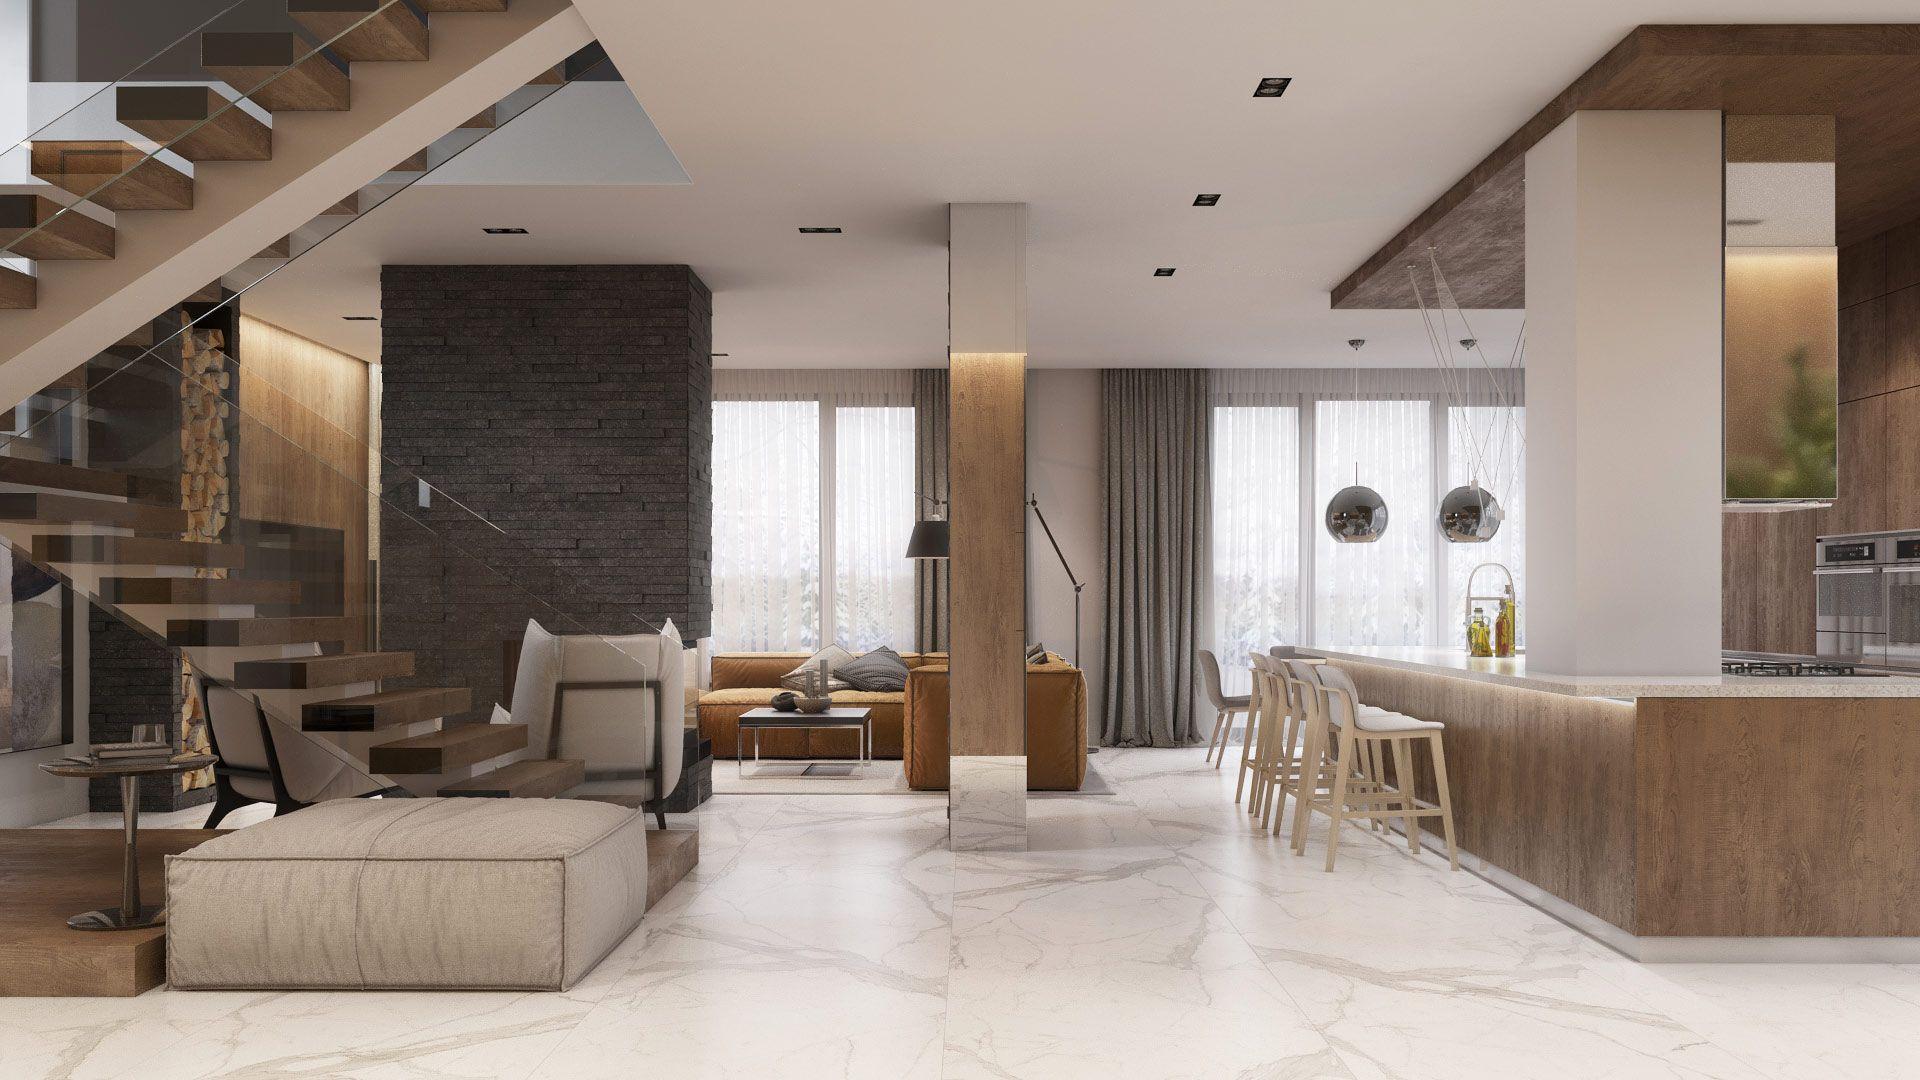 Forest house, IQOSA | апартаменты | Pinterest | House, Internal ...